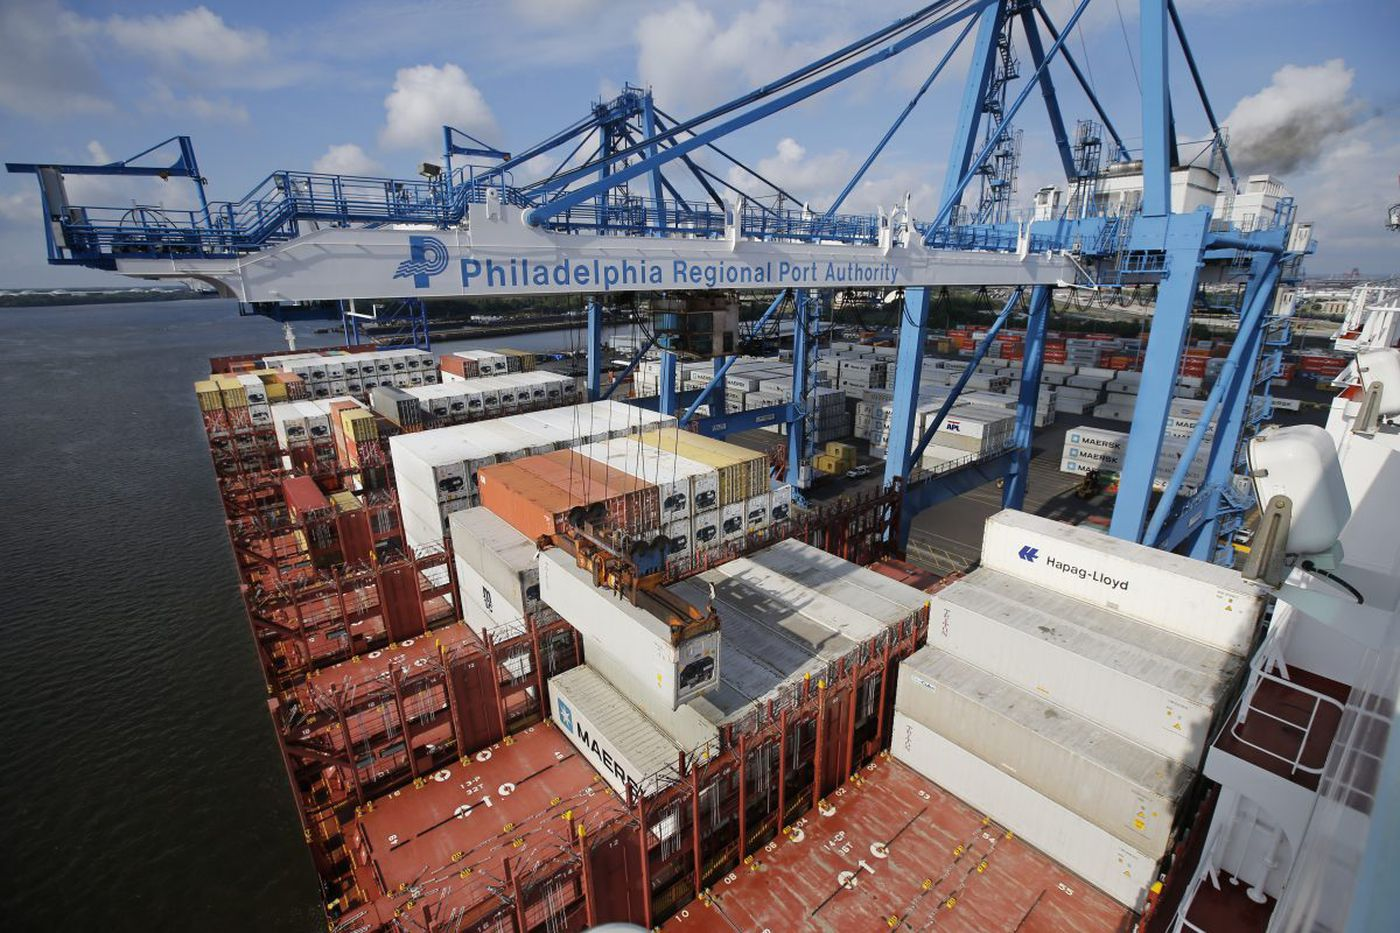 The Philadelphia port gets a new name: PhilaPort